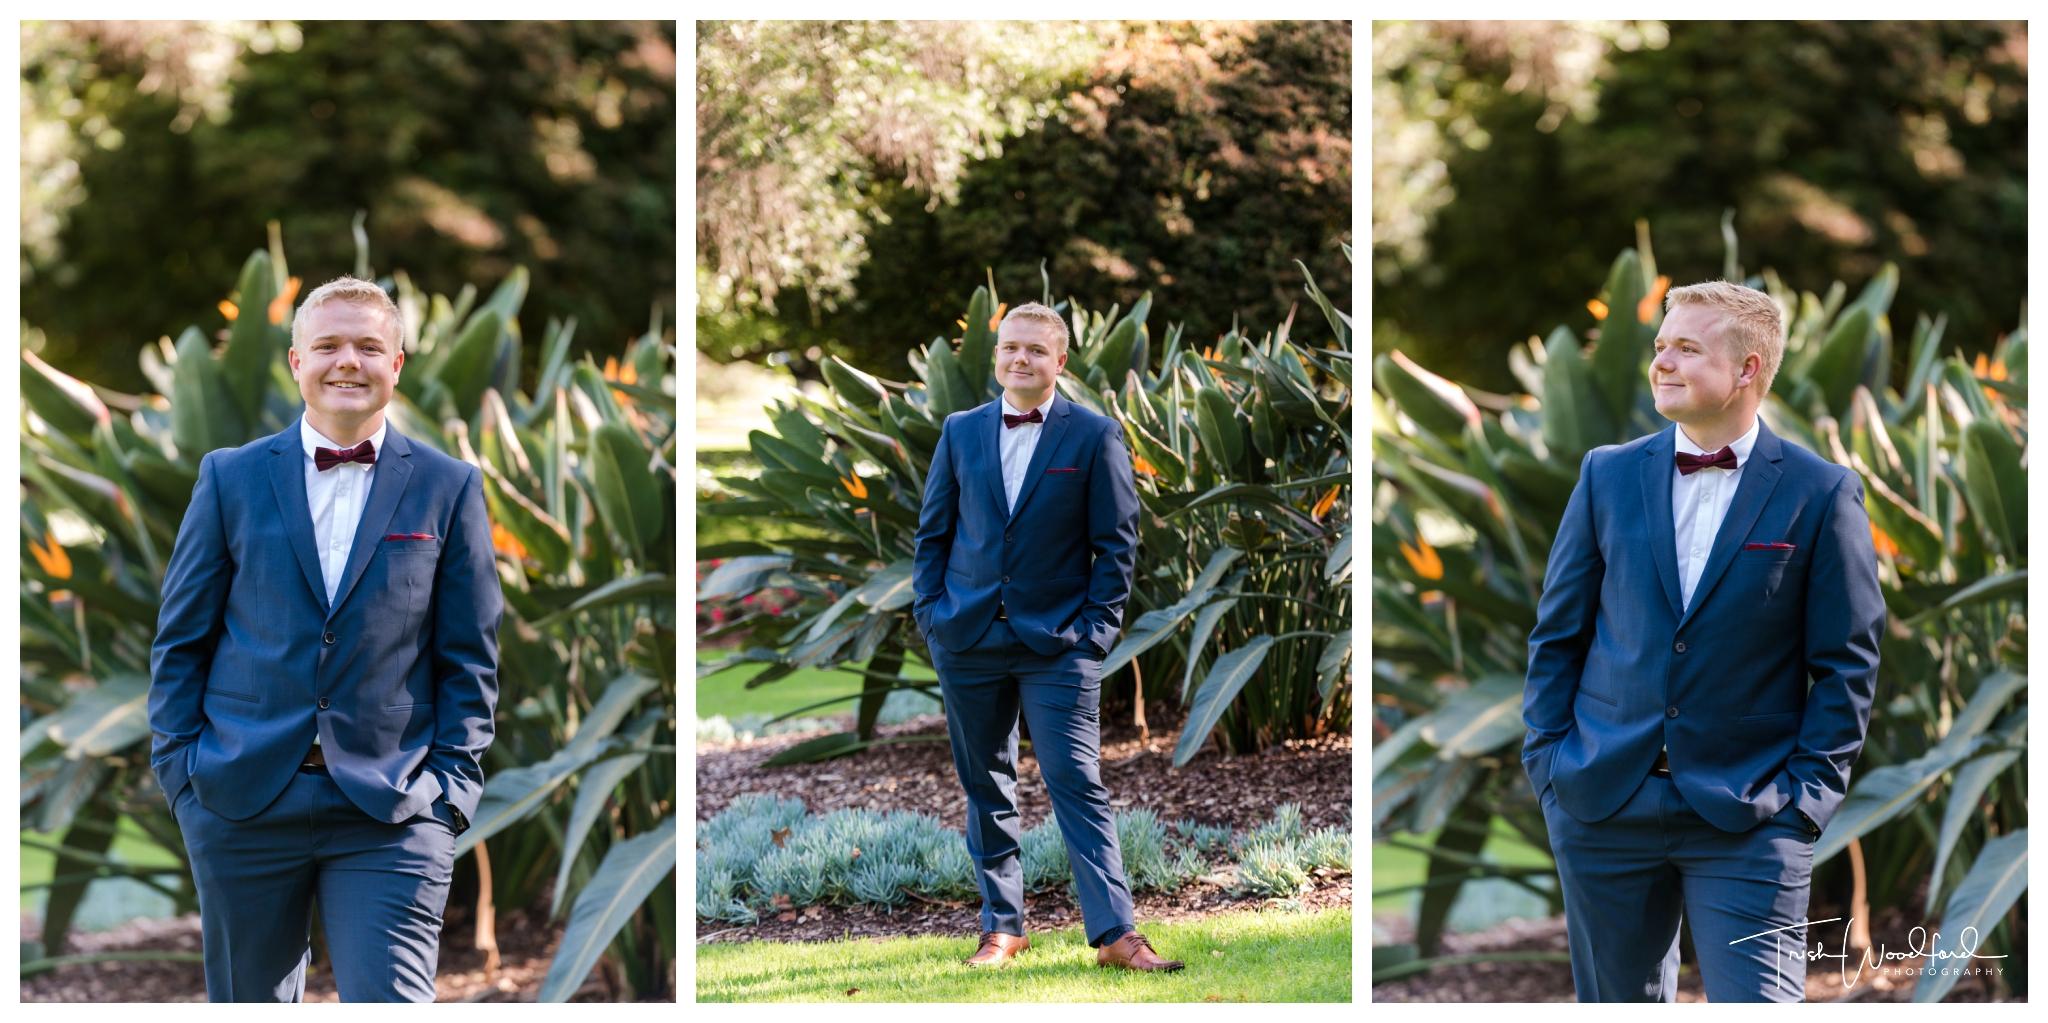 groom-hyde-park-wedding